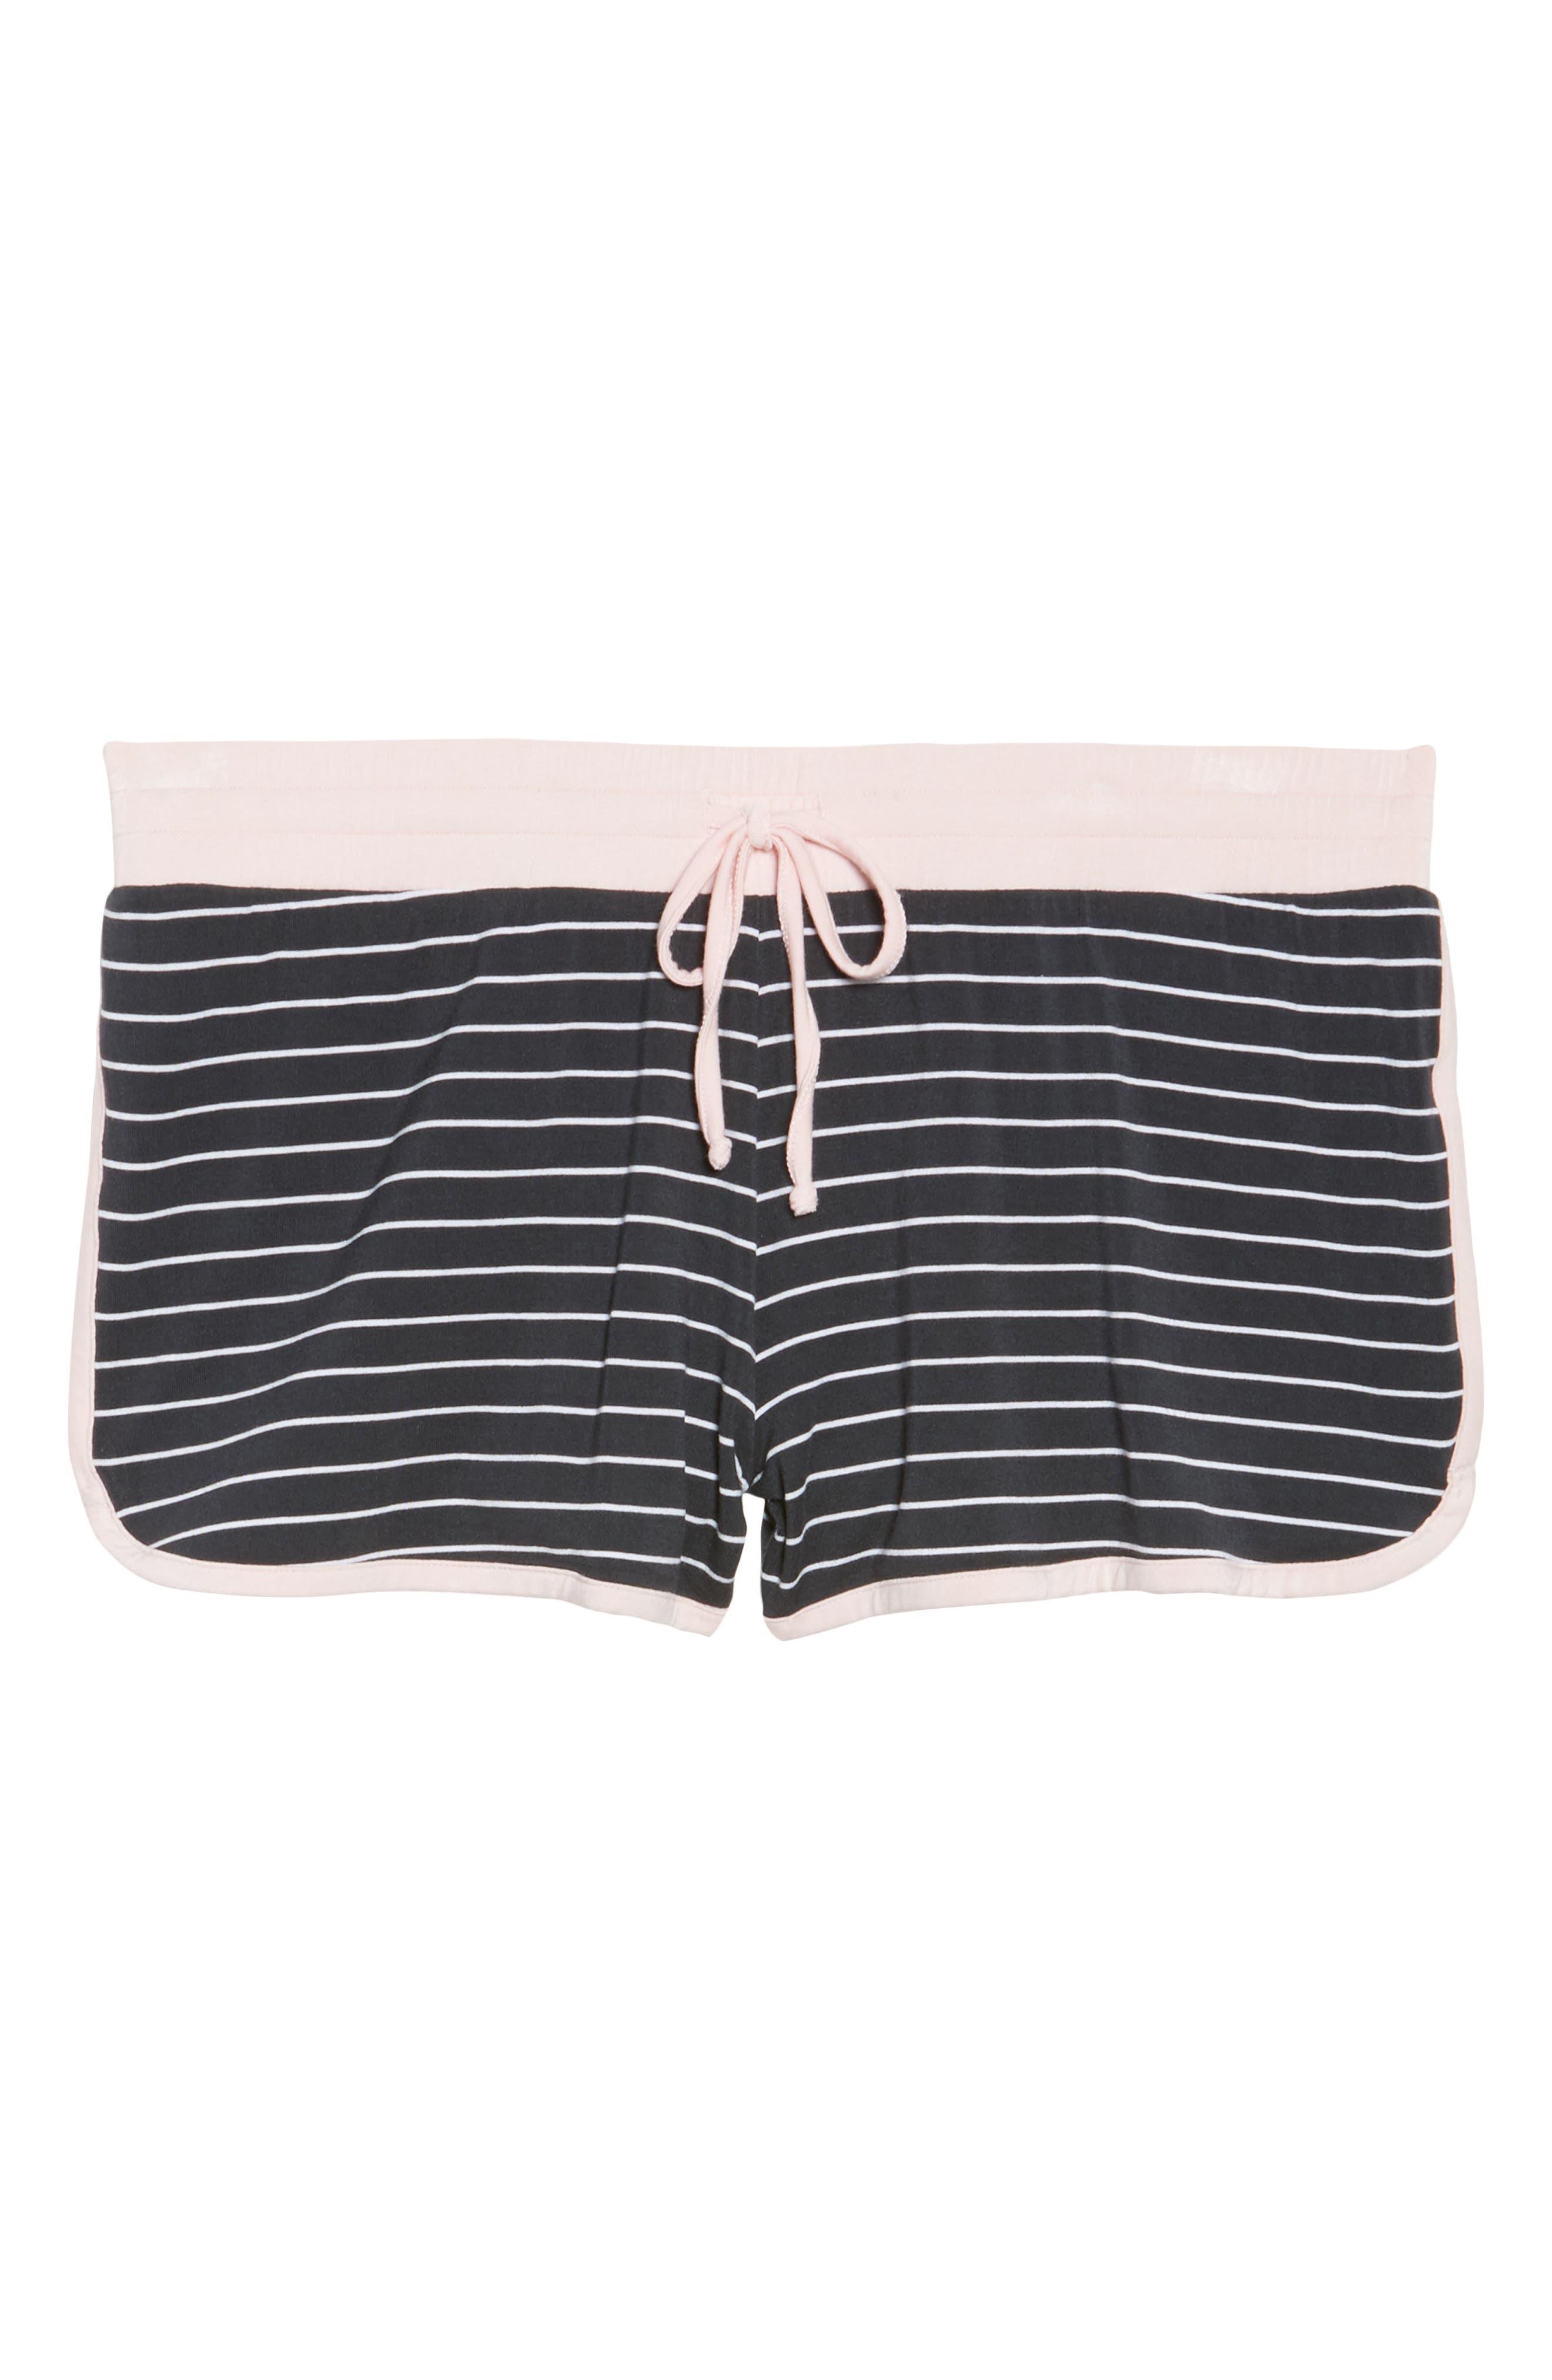 Stripe Jersey Shorts,                             Alternate thumbnail 6, color,                             030